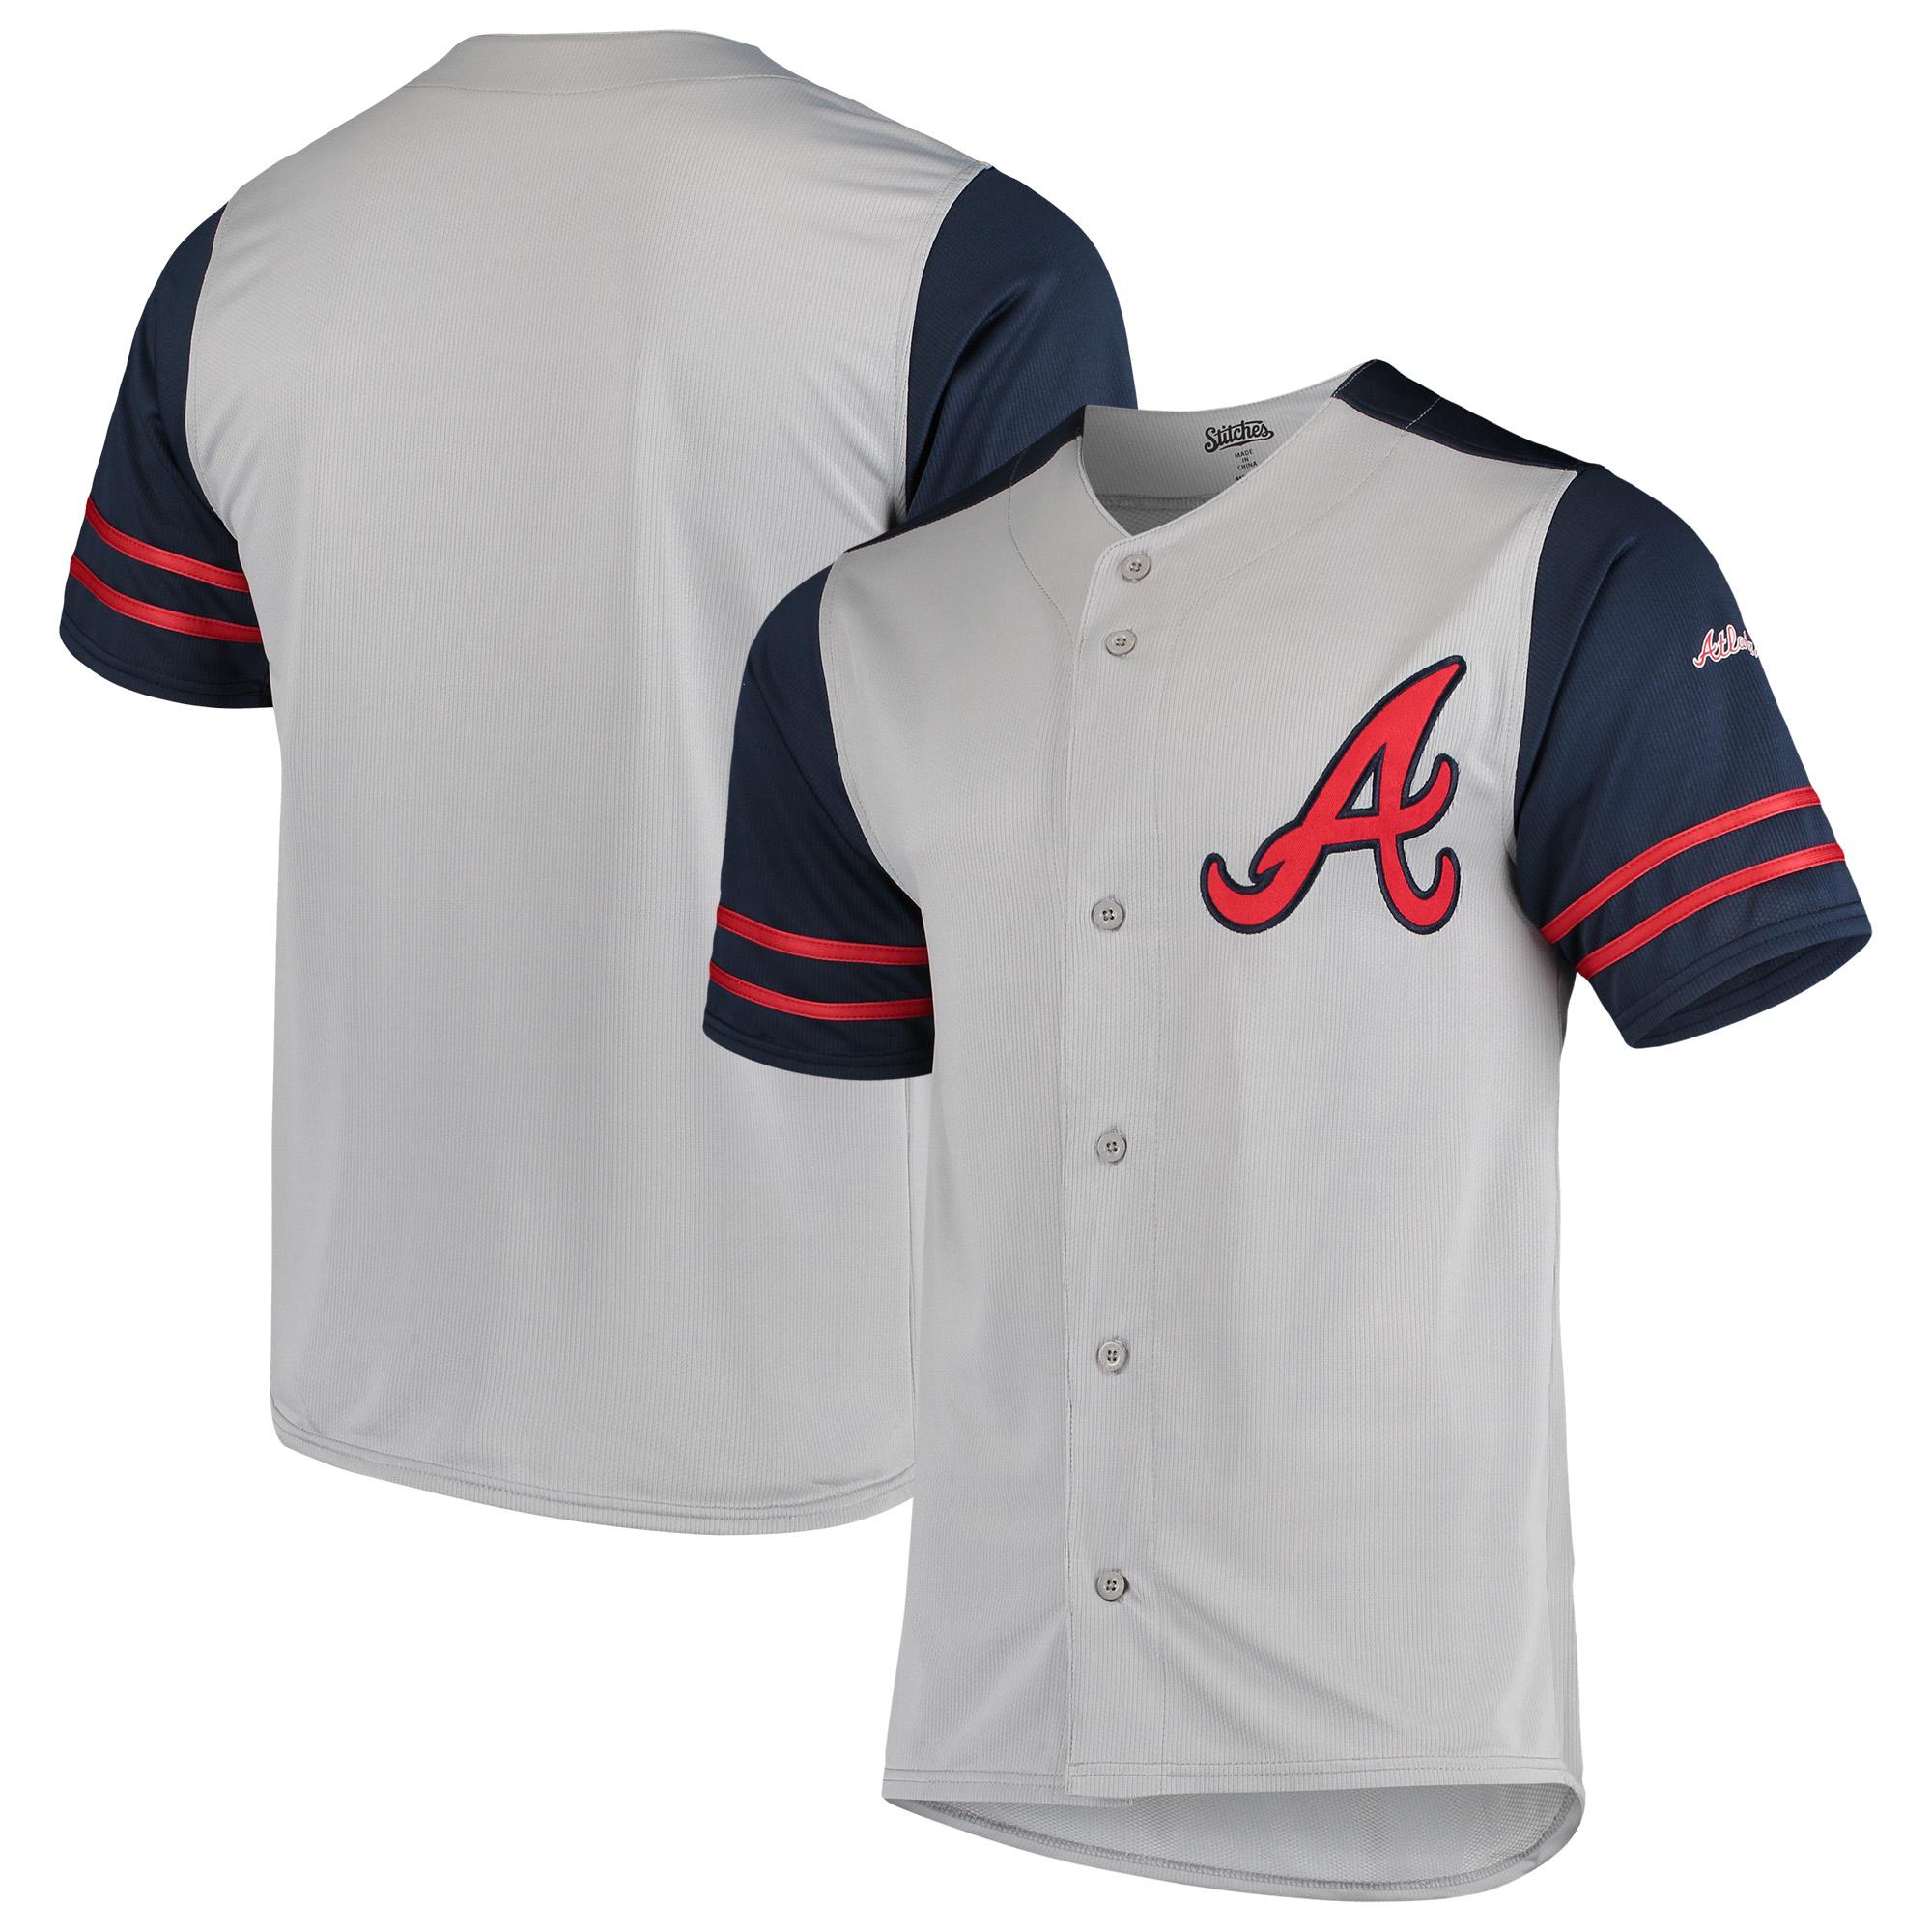 Atlanta Braves Stitches Button-Up Jersey - Gray/Navy